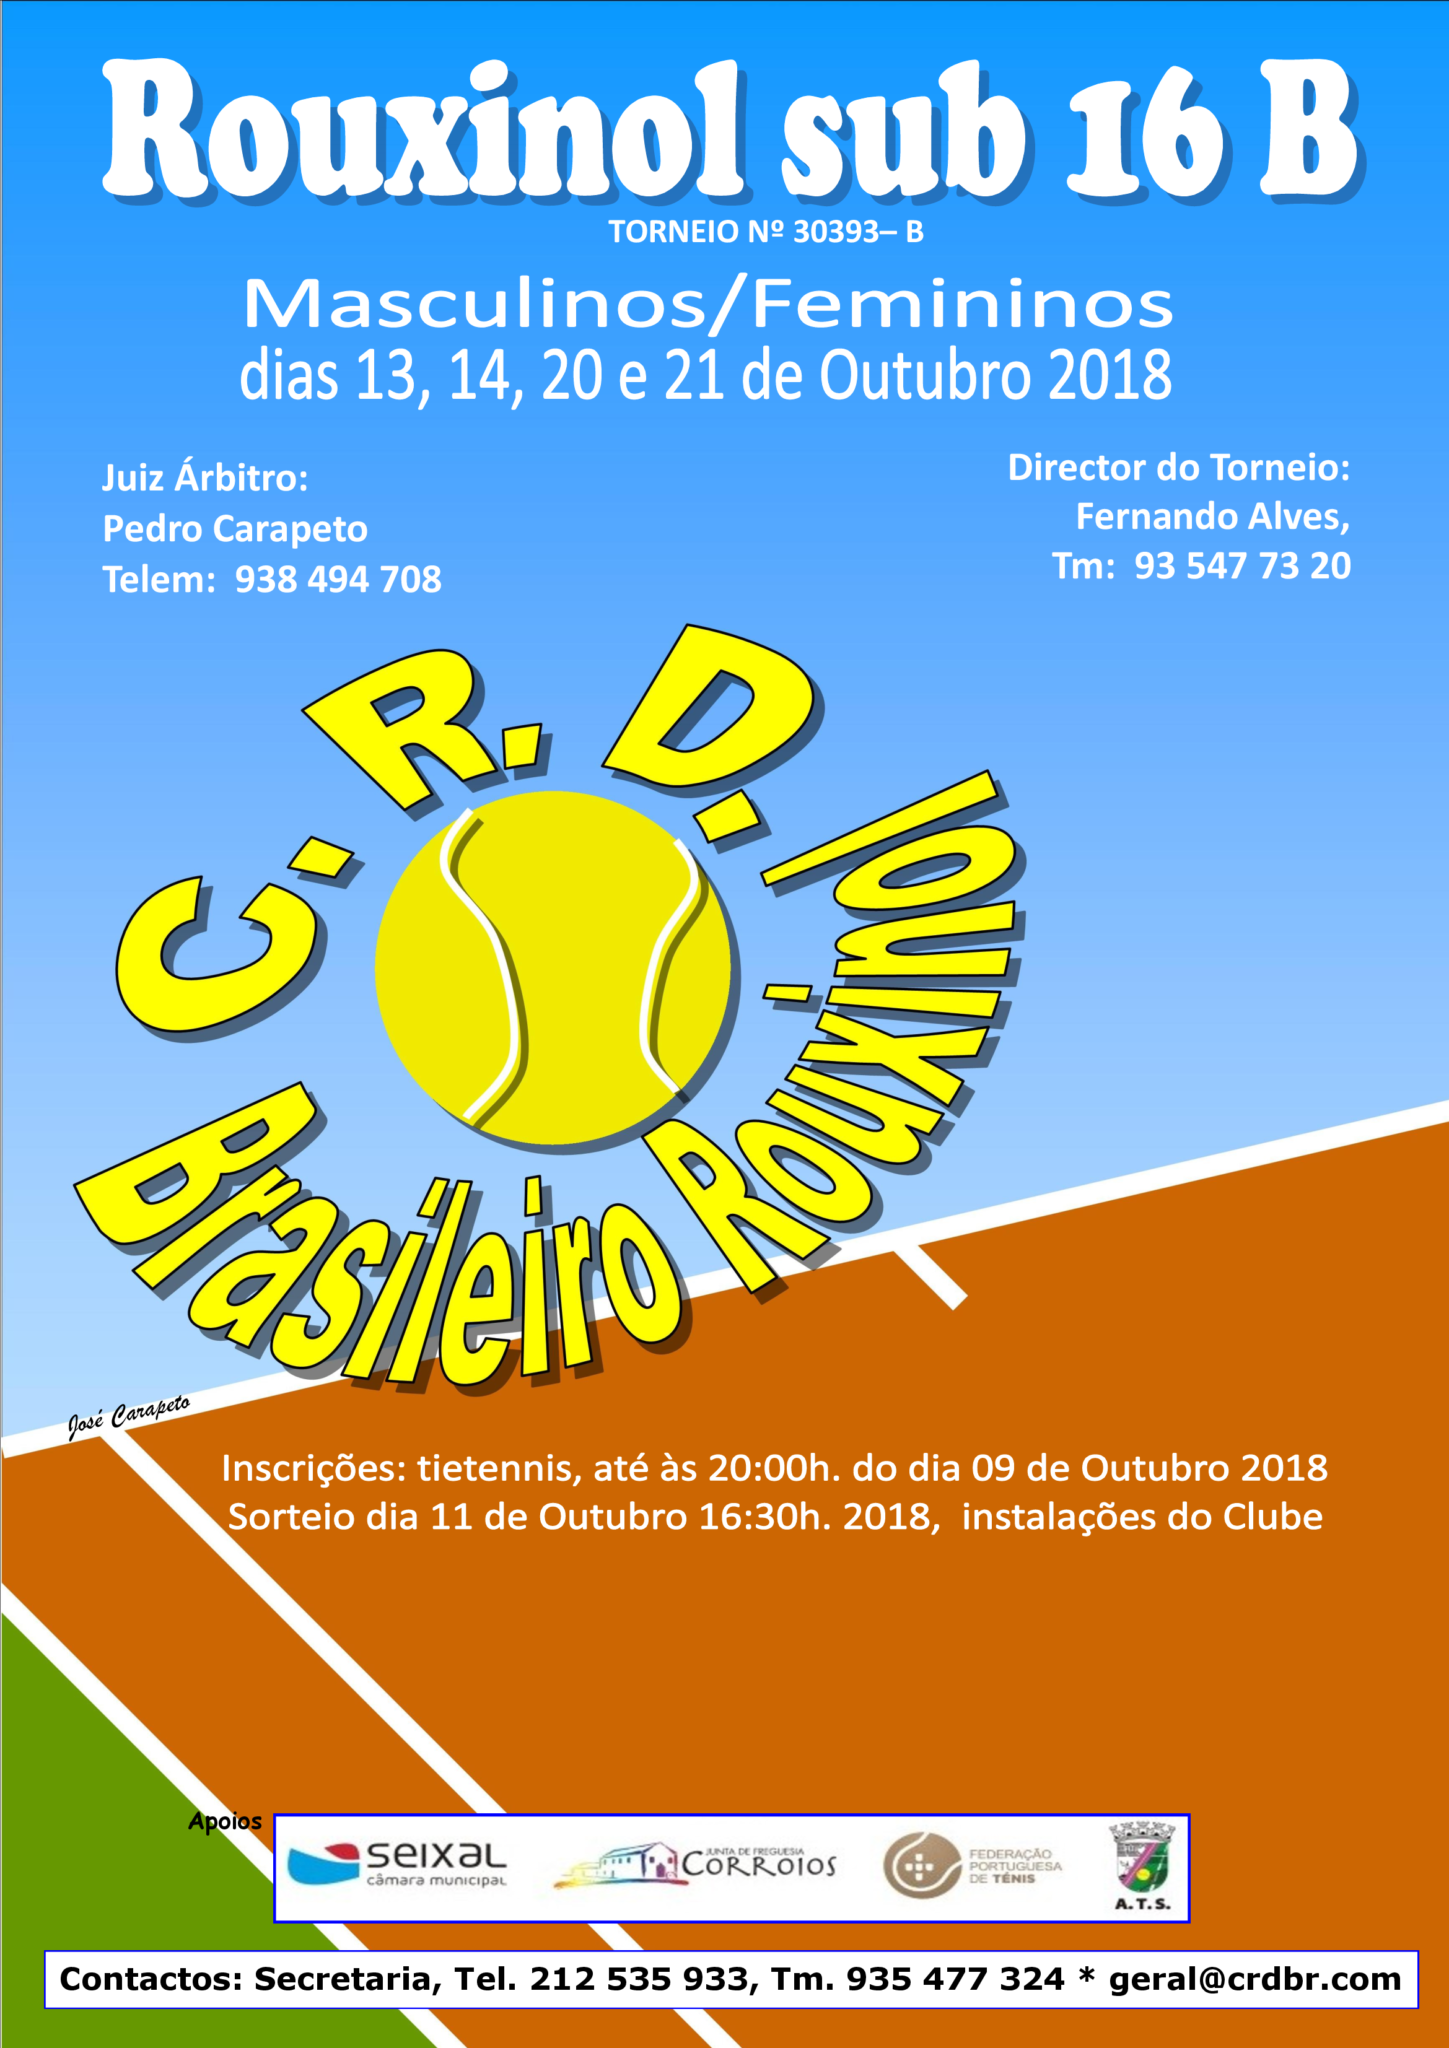 Torneio B Rouxinol sub /16